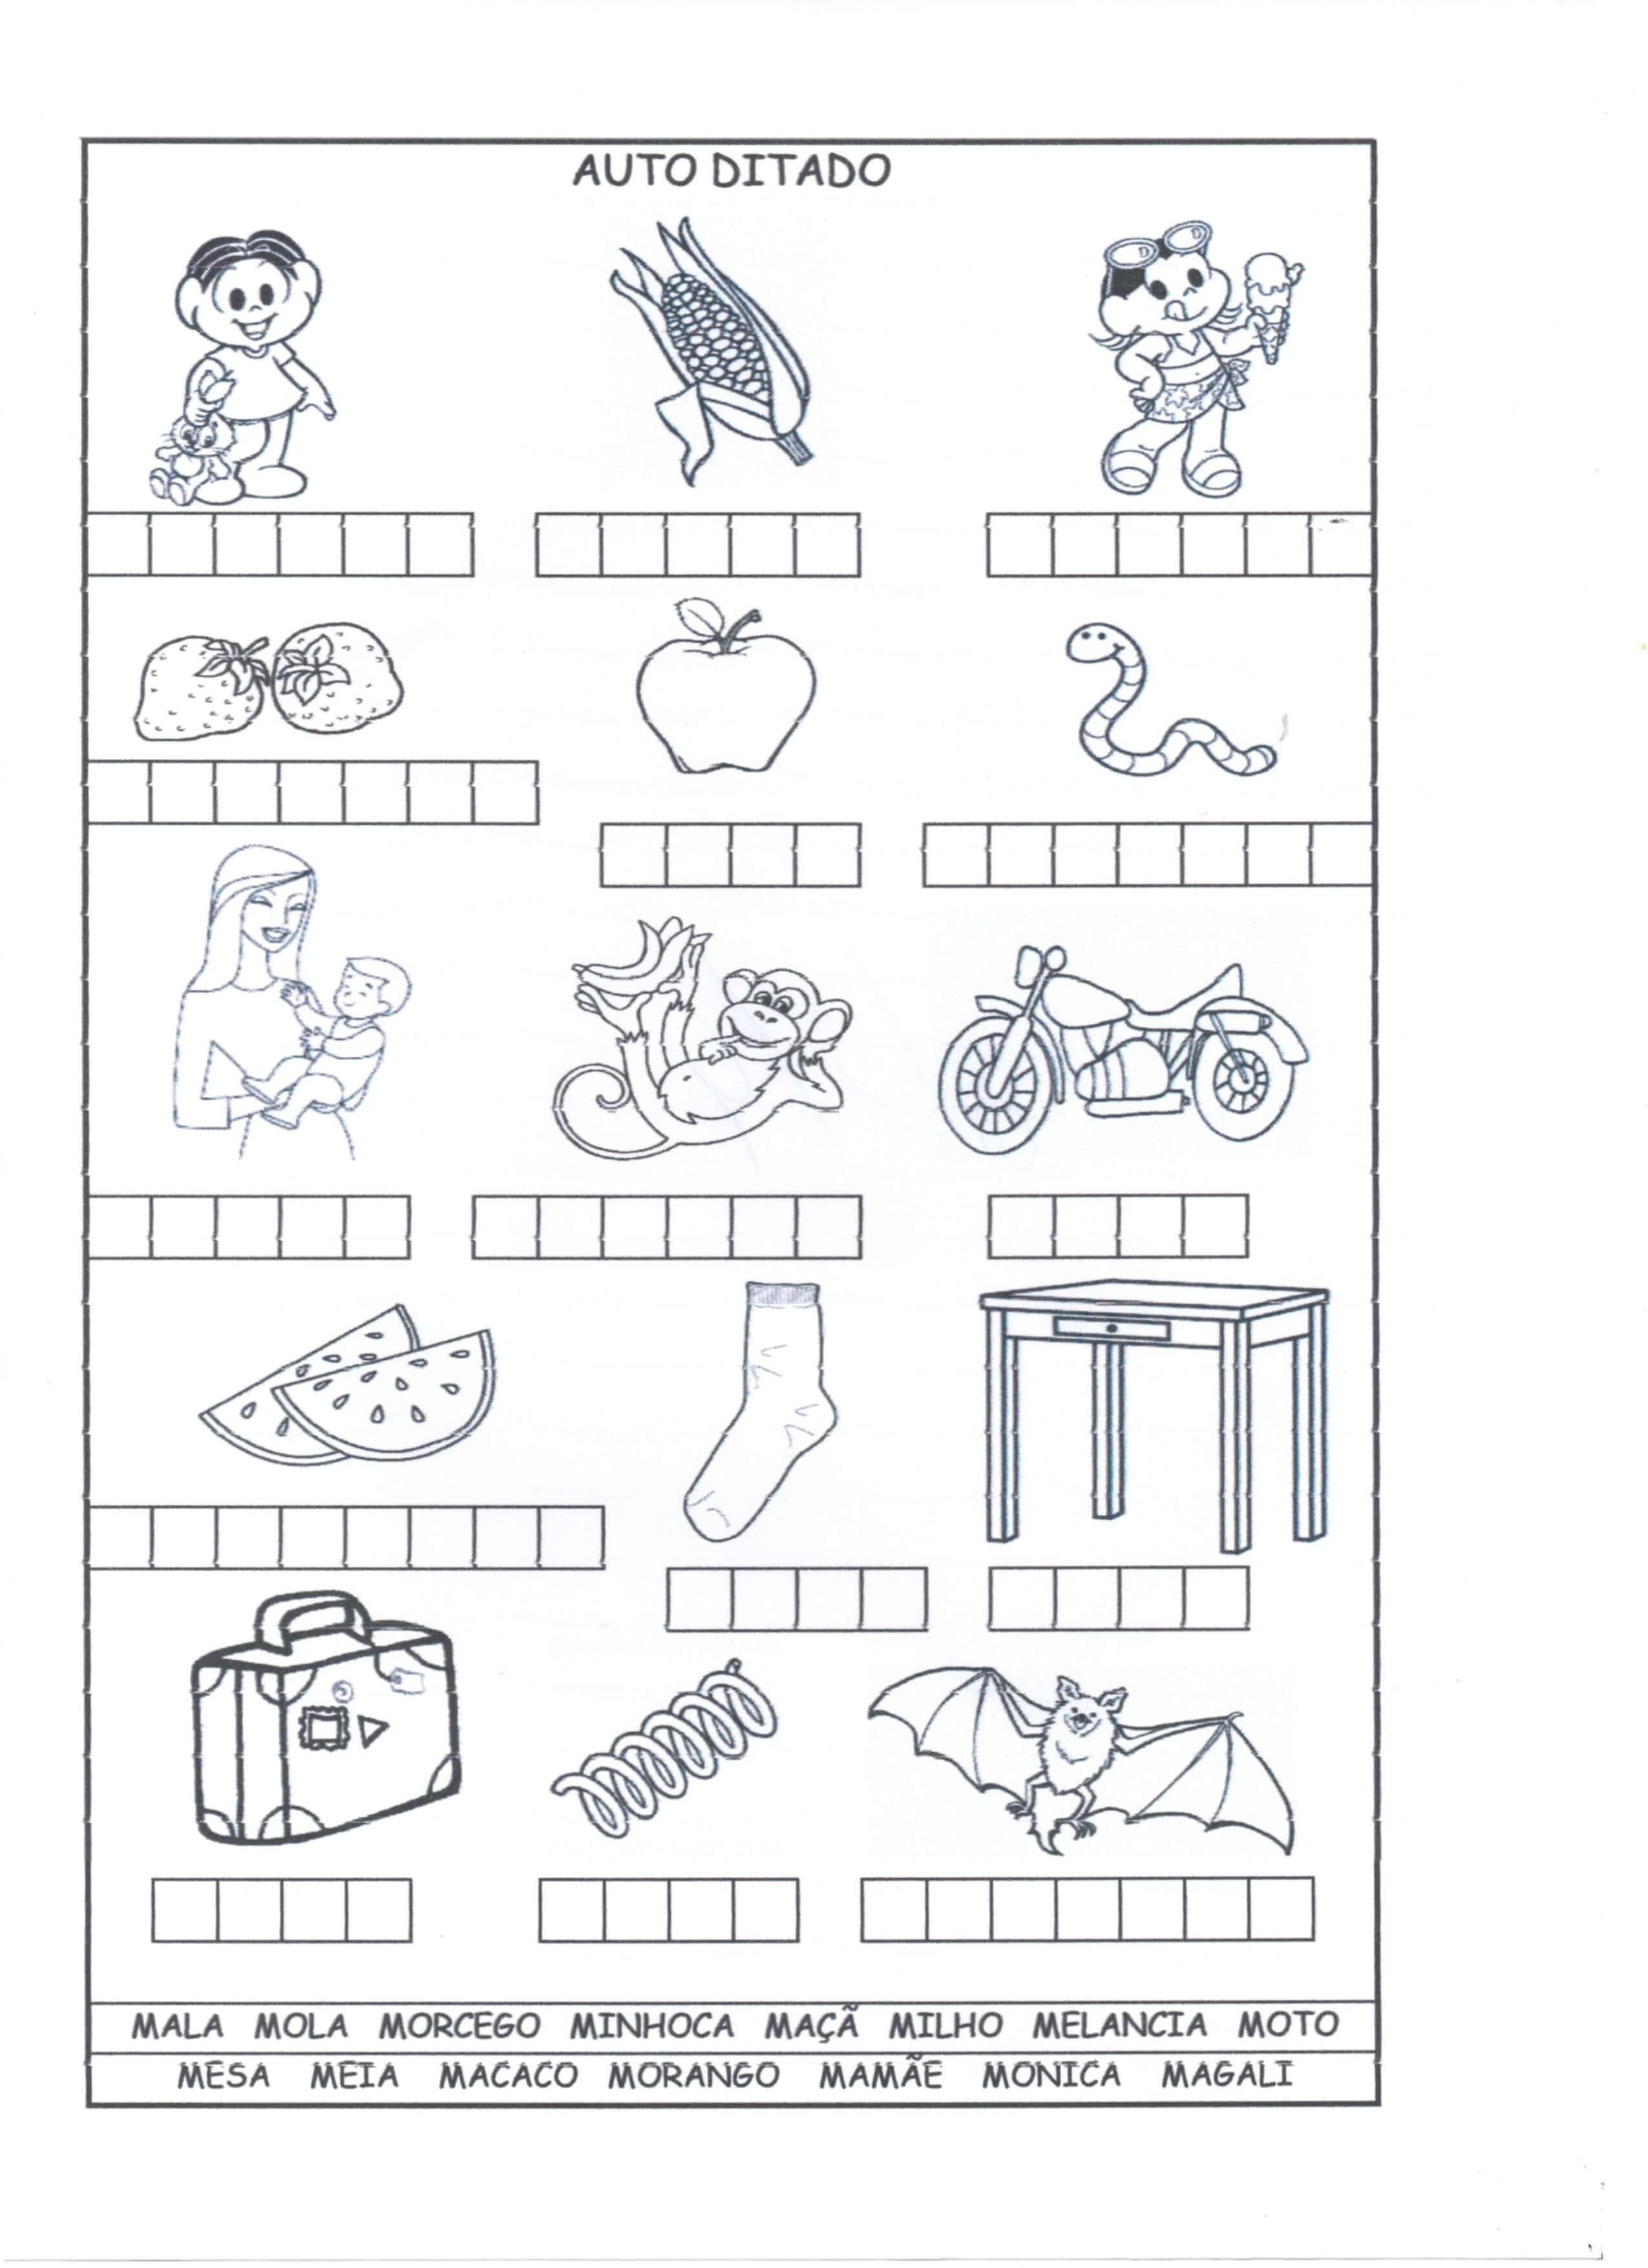 Calendario Para Imprimir 2019 Turma Da Monica Mejores Y Más Novedosos atividades Banco De Palavras • Alfabetiza§£o Blog